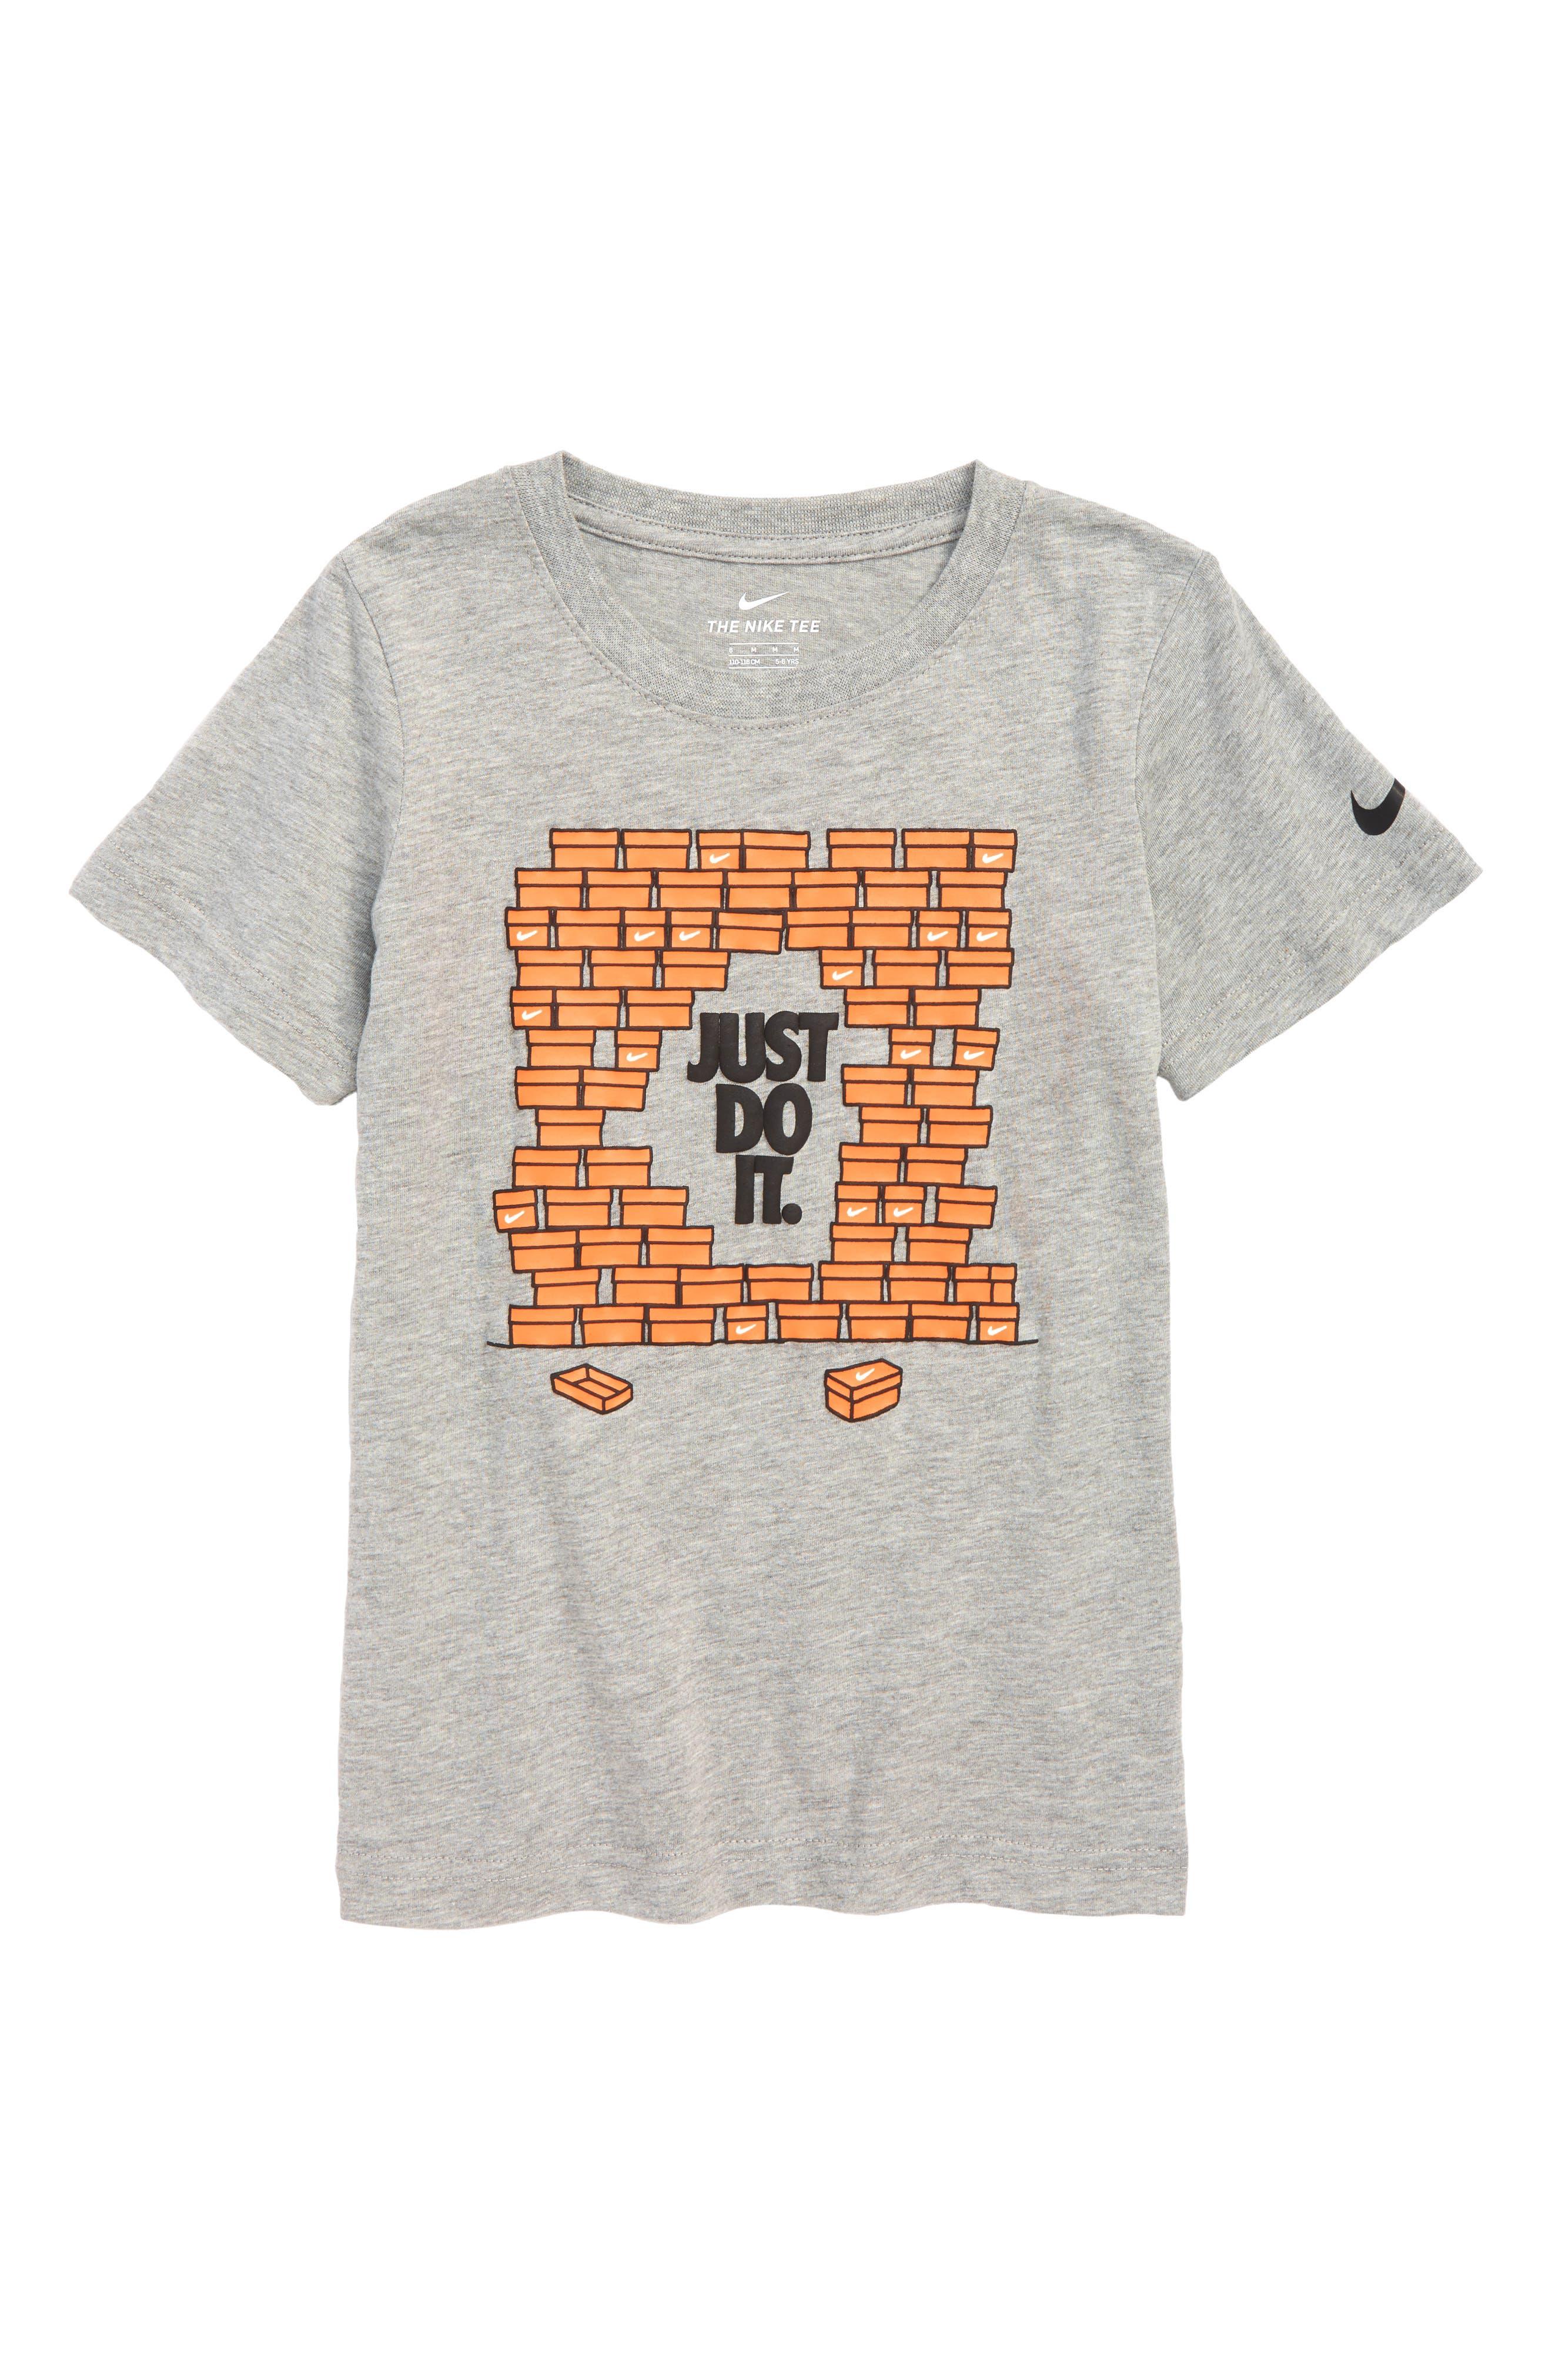 Shoebox Just Do It T-Shirt,                         Main,                         color, DARK GREY HEATHER